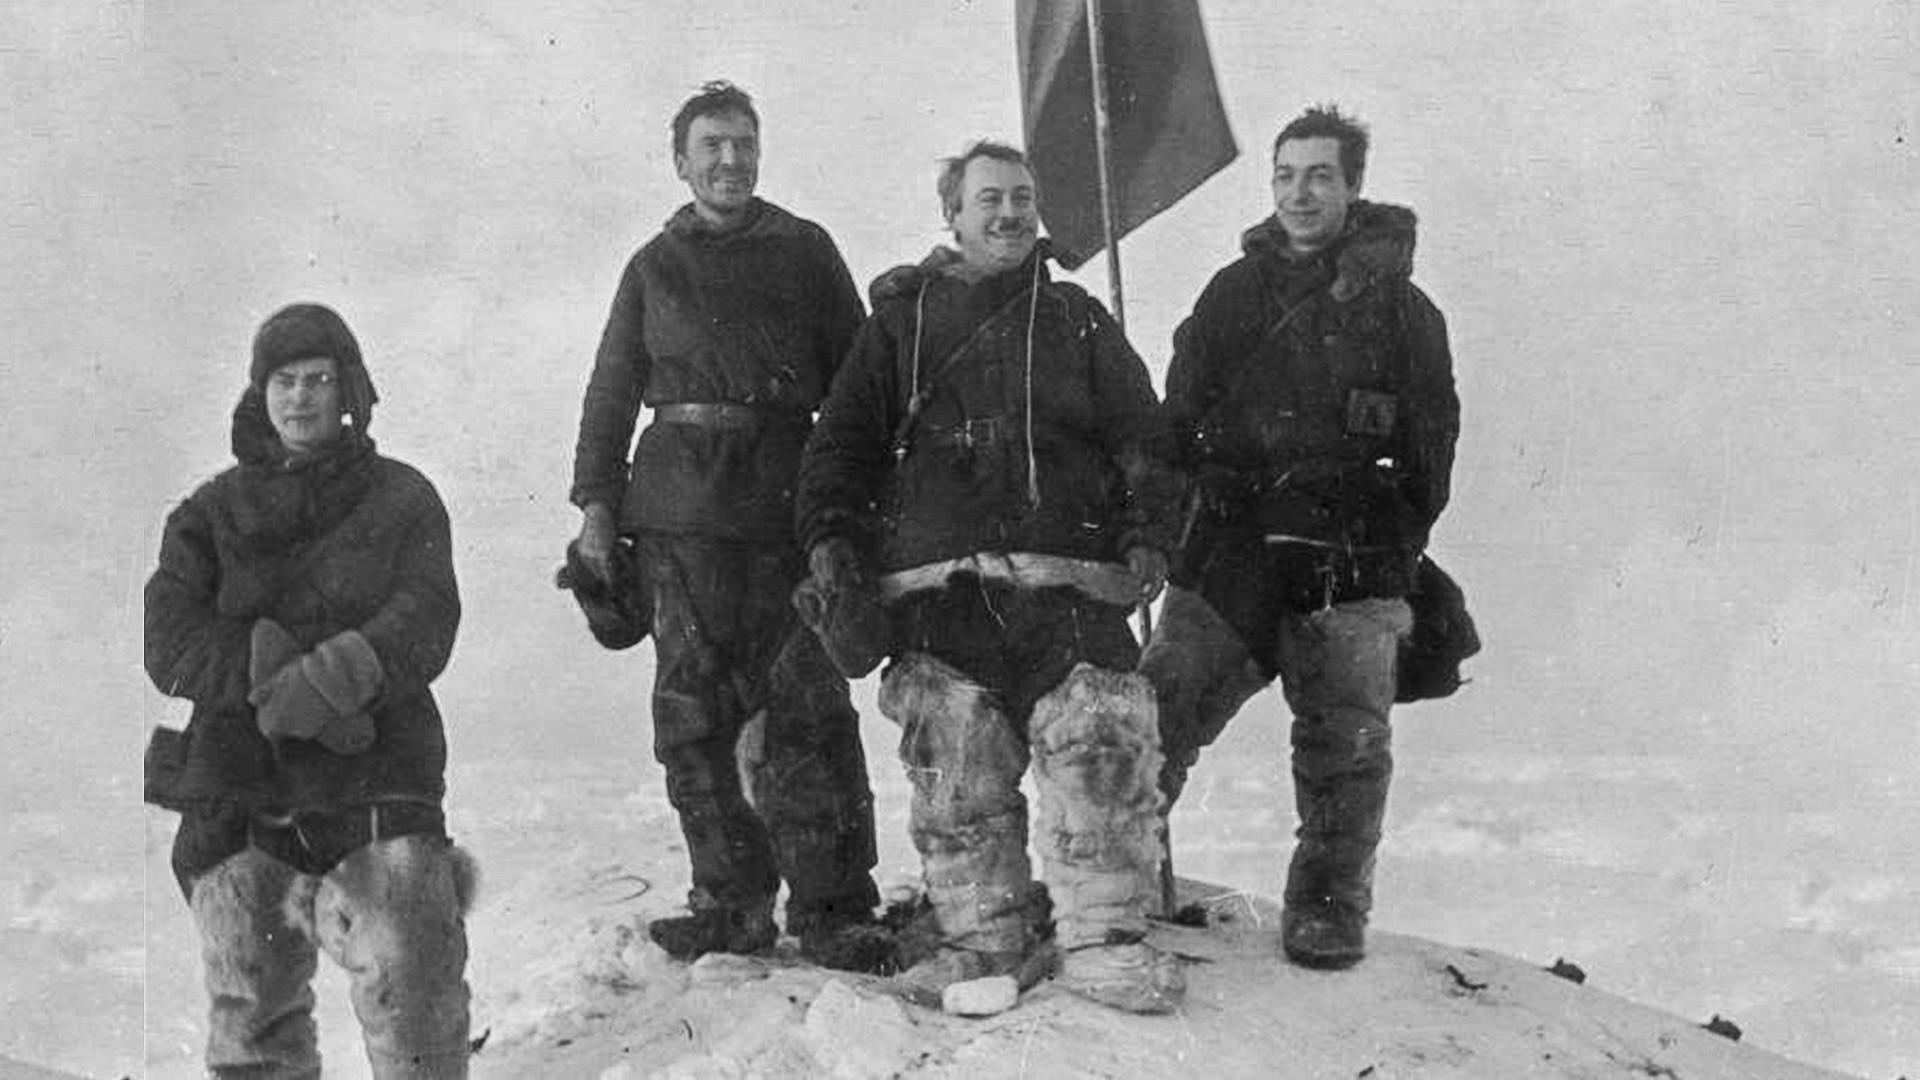 Pjotr Schirchow, Ernst Krenkel, Iwan Papanin, Jewgeni Fjodorow